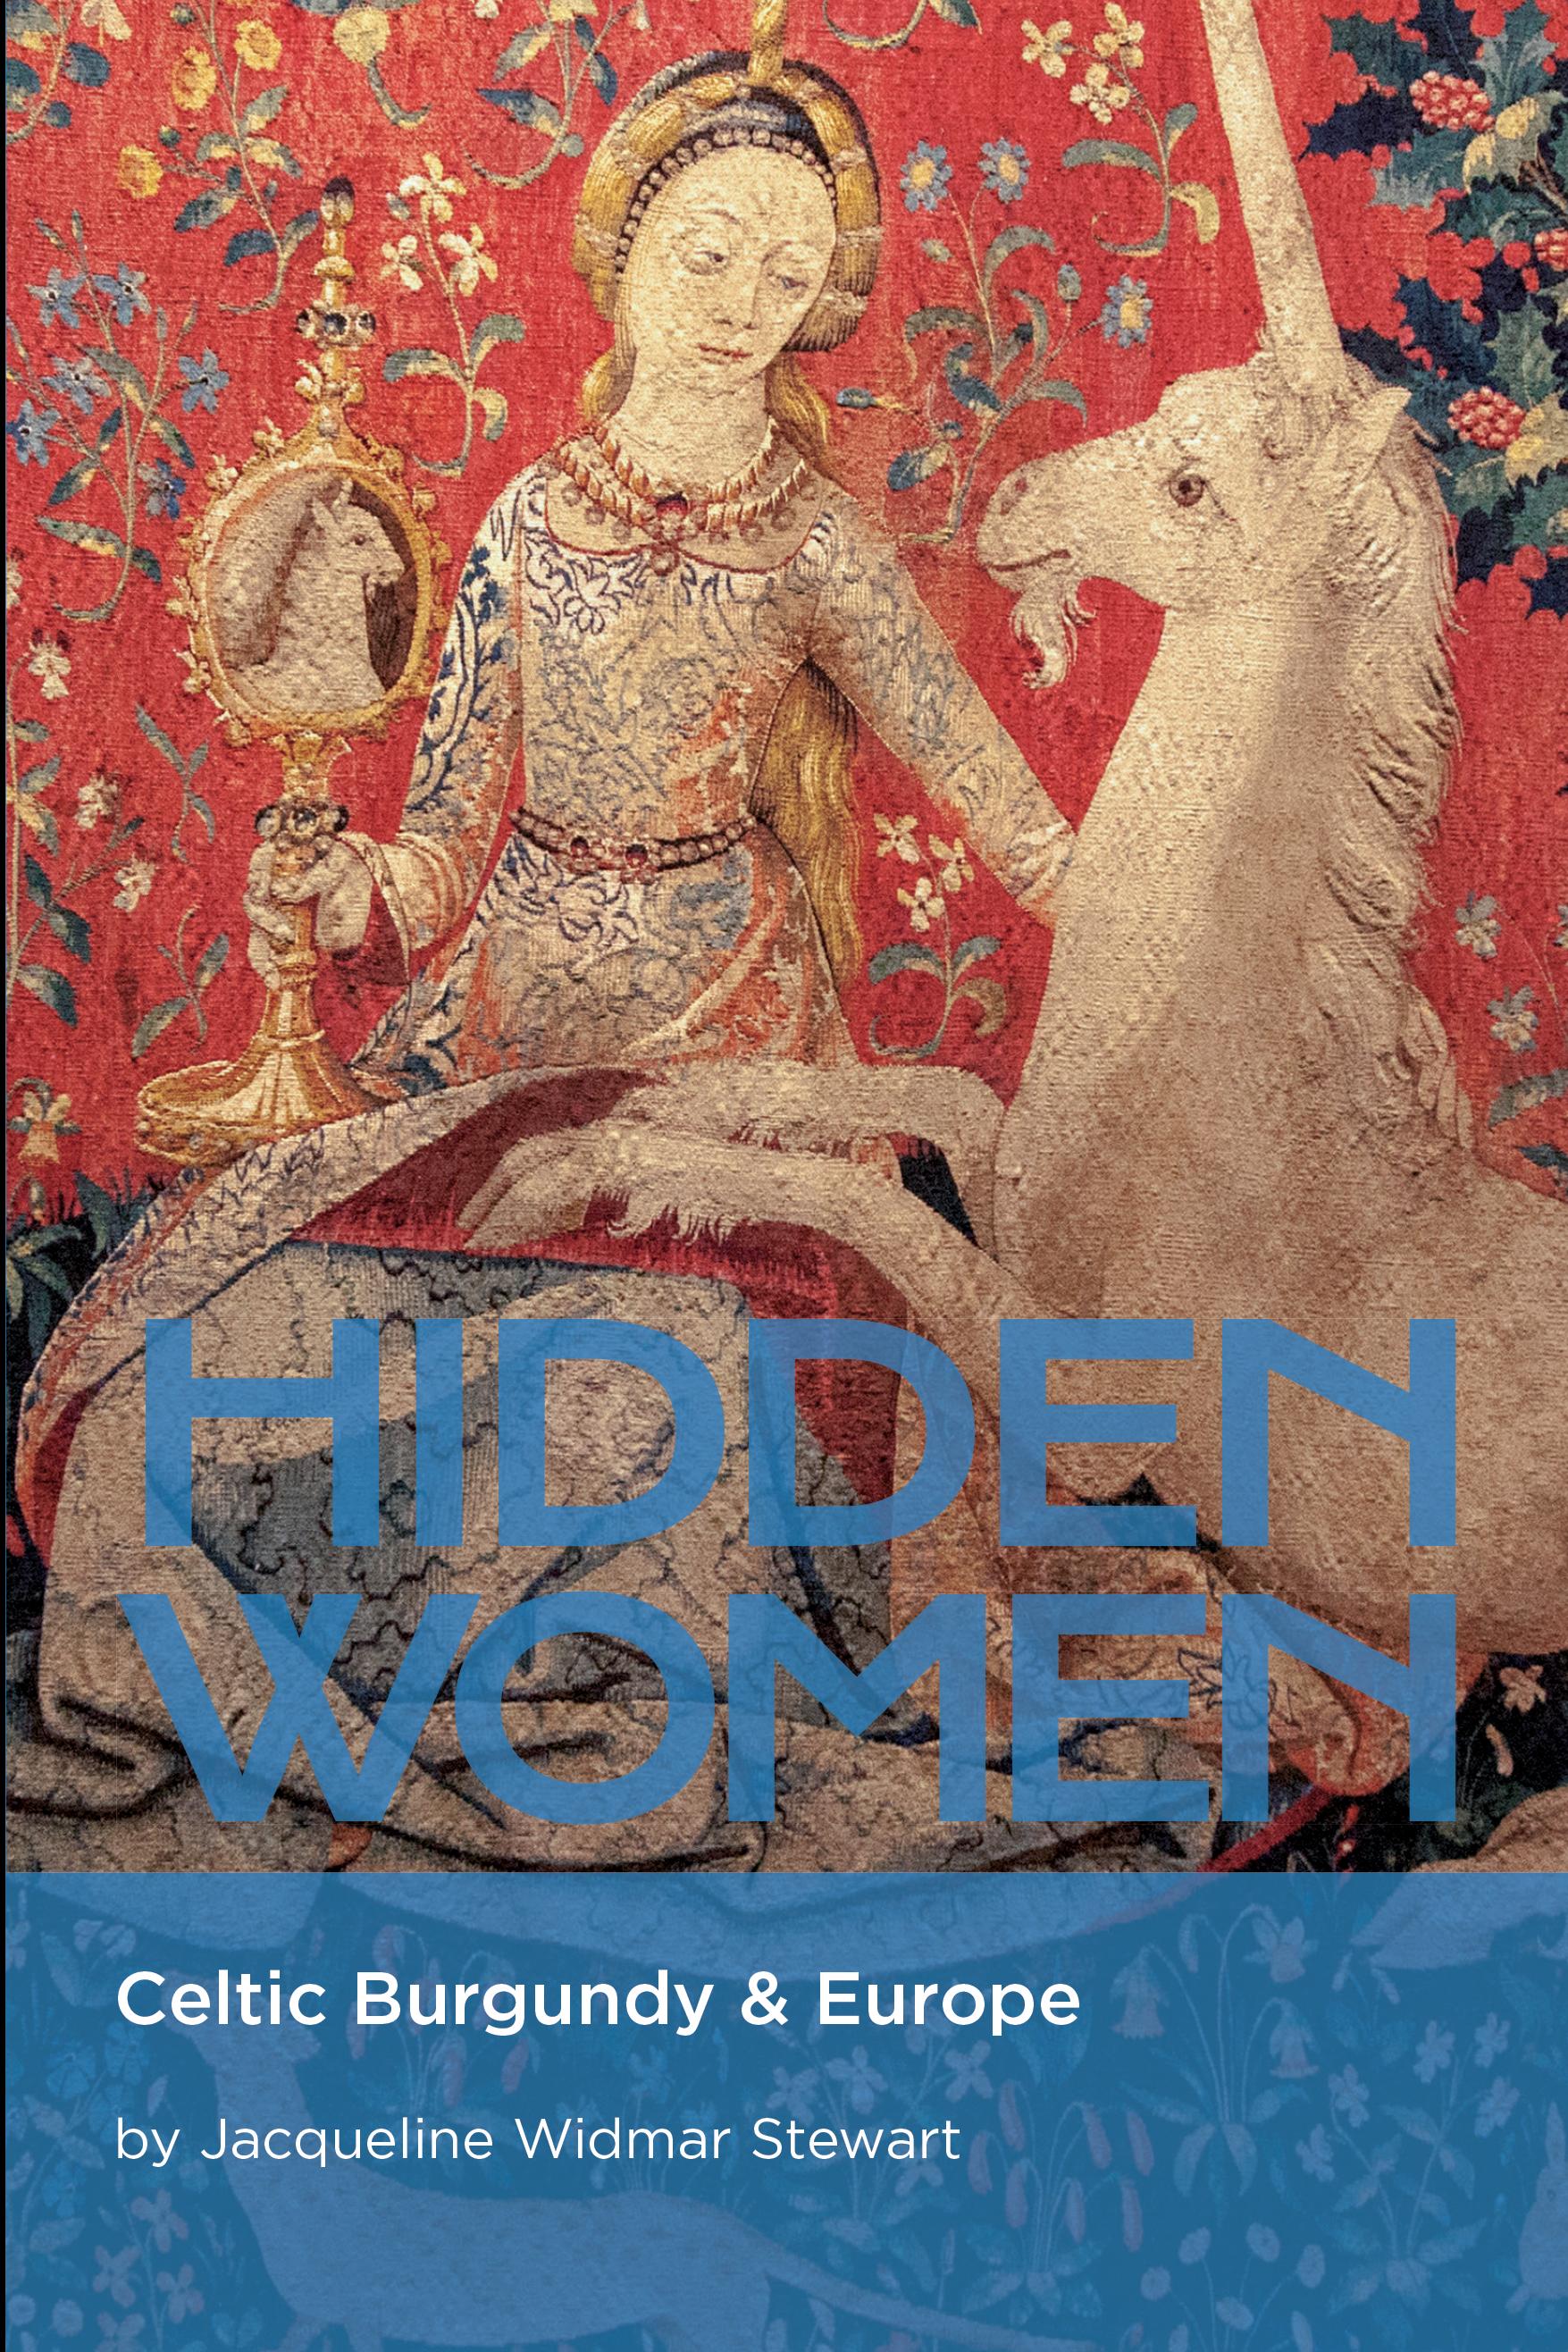 HWB_Burgundy_Paperback-cover-approved.png